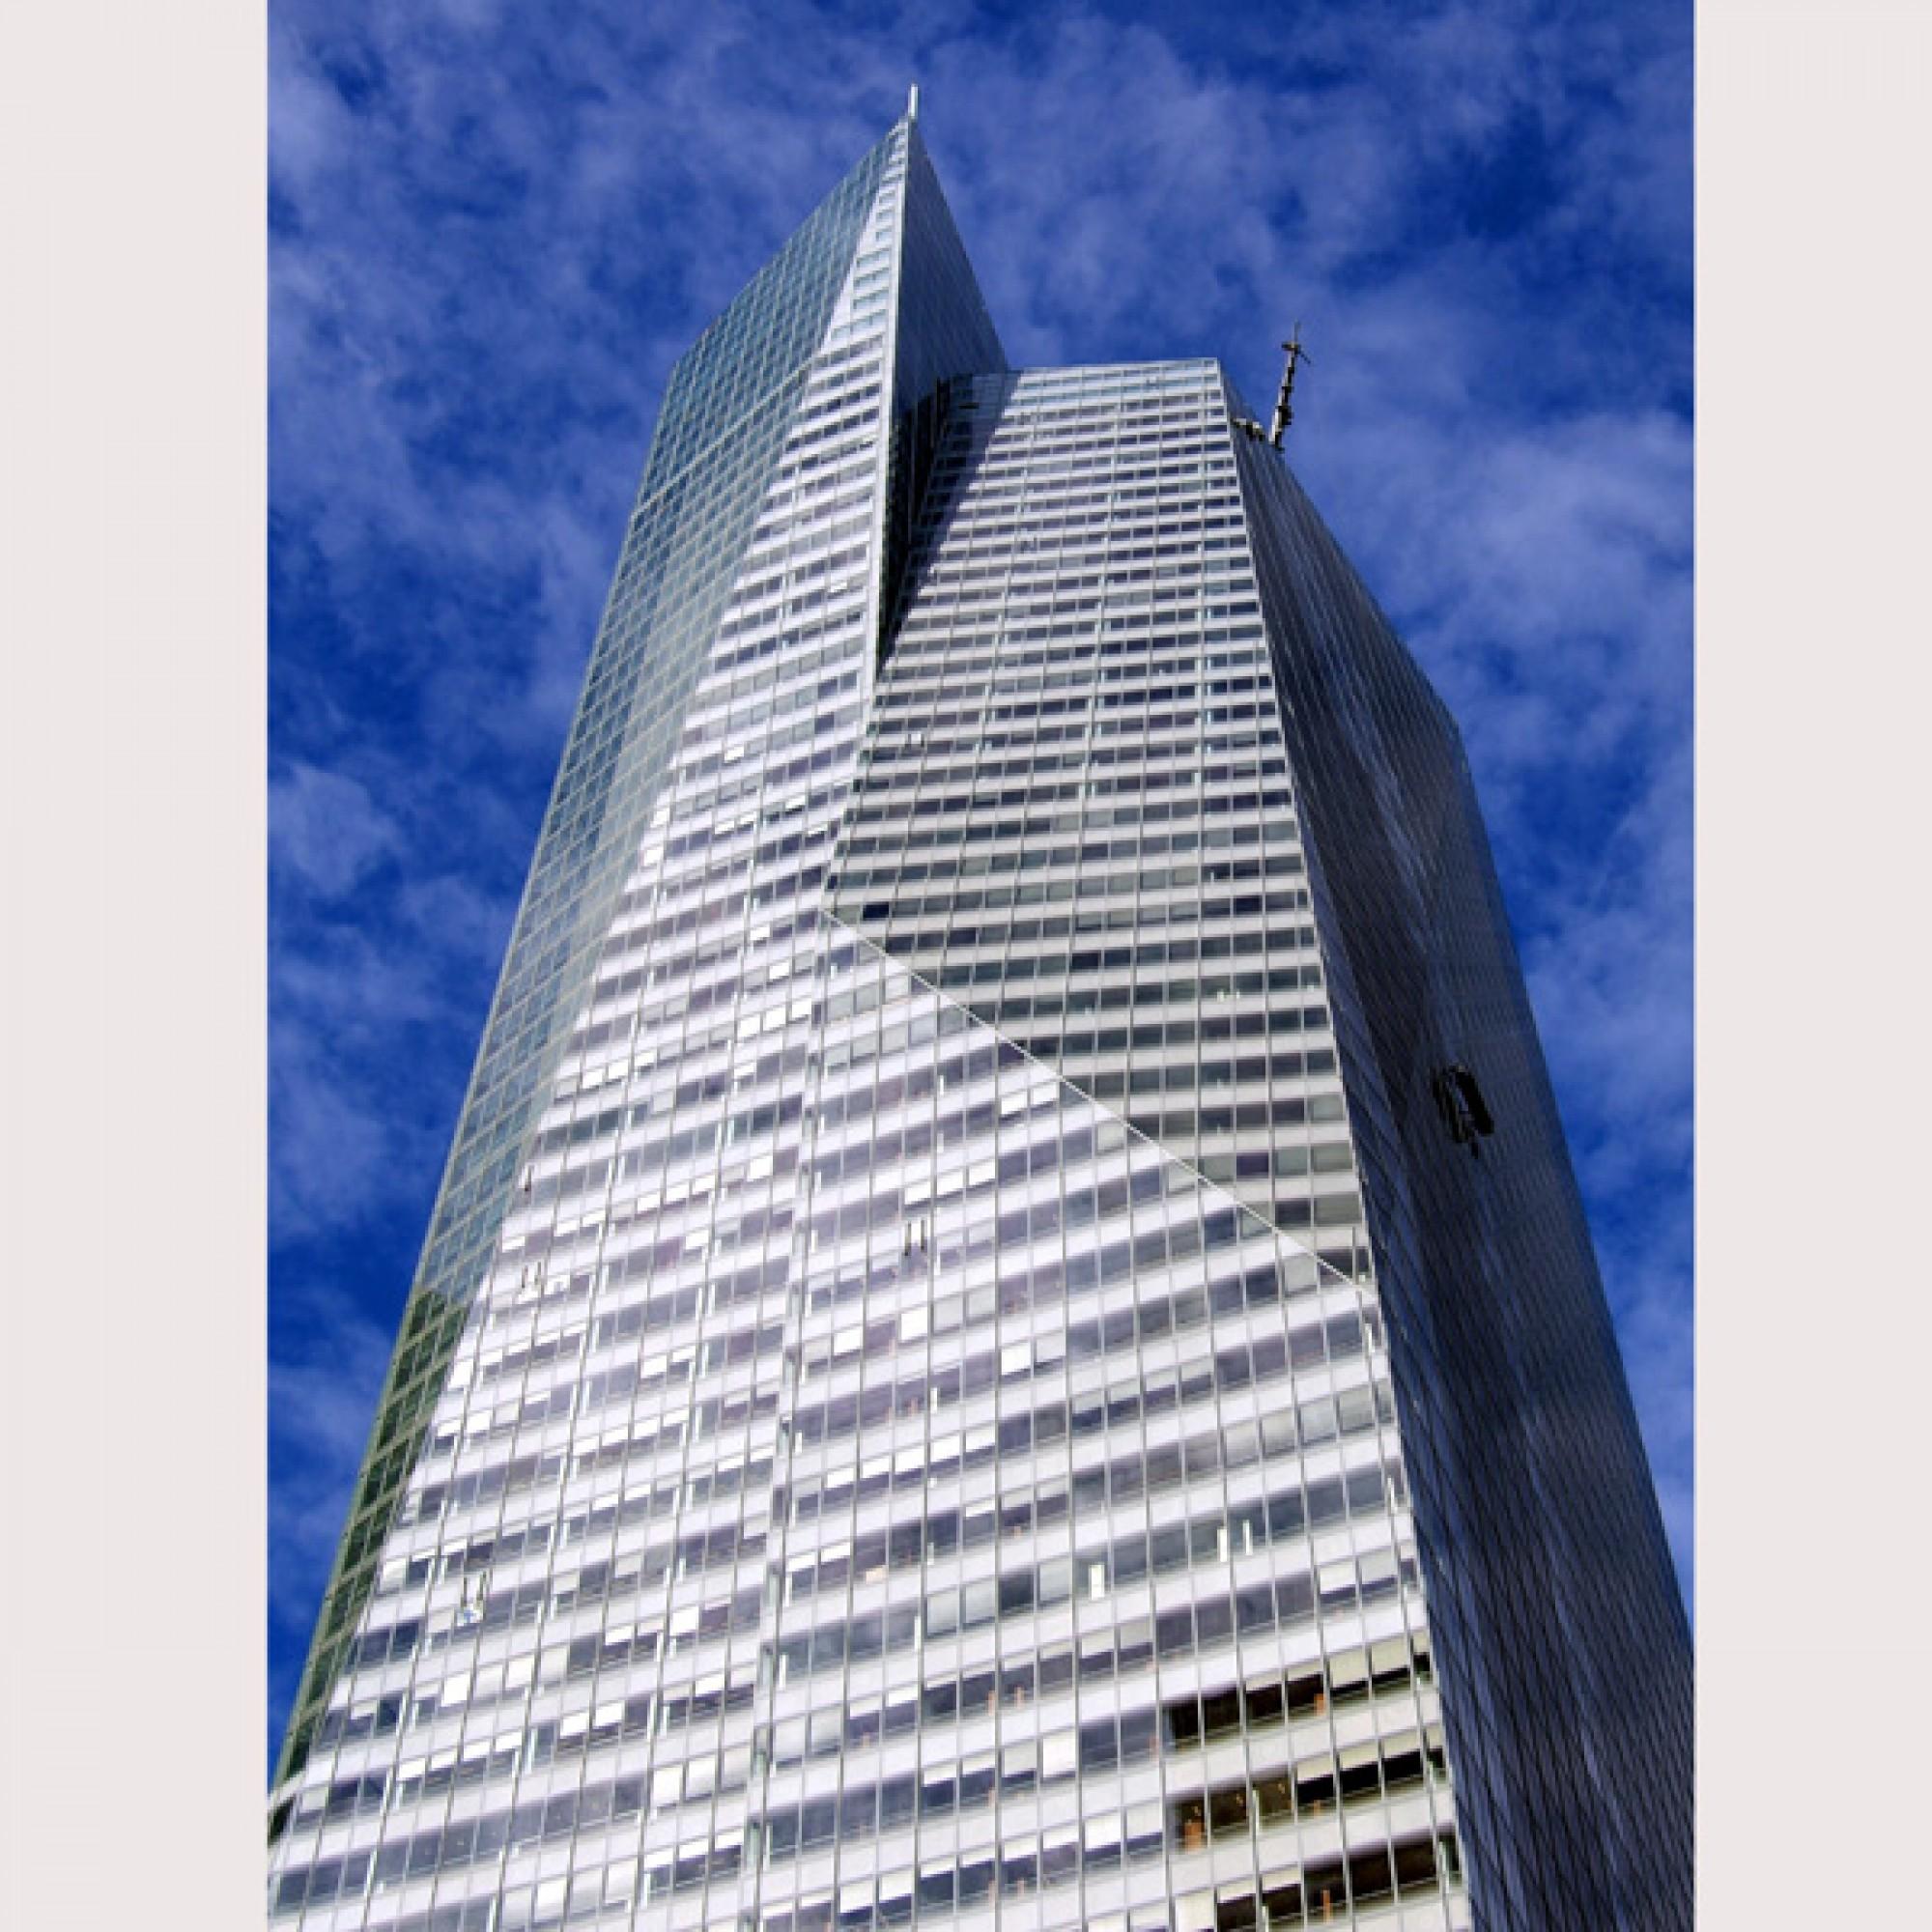 Bank of America Tower, New York, USA (John W. Cahill)